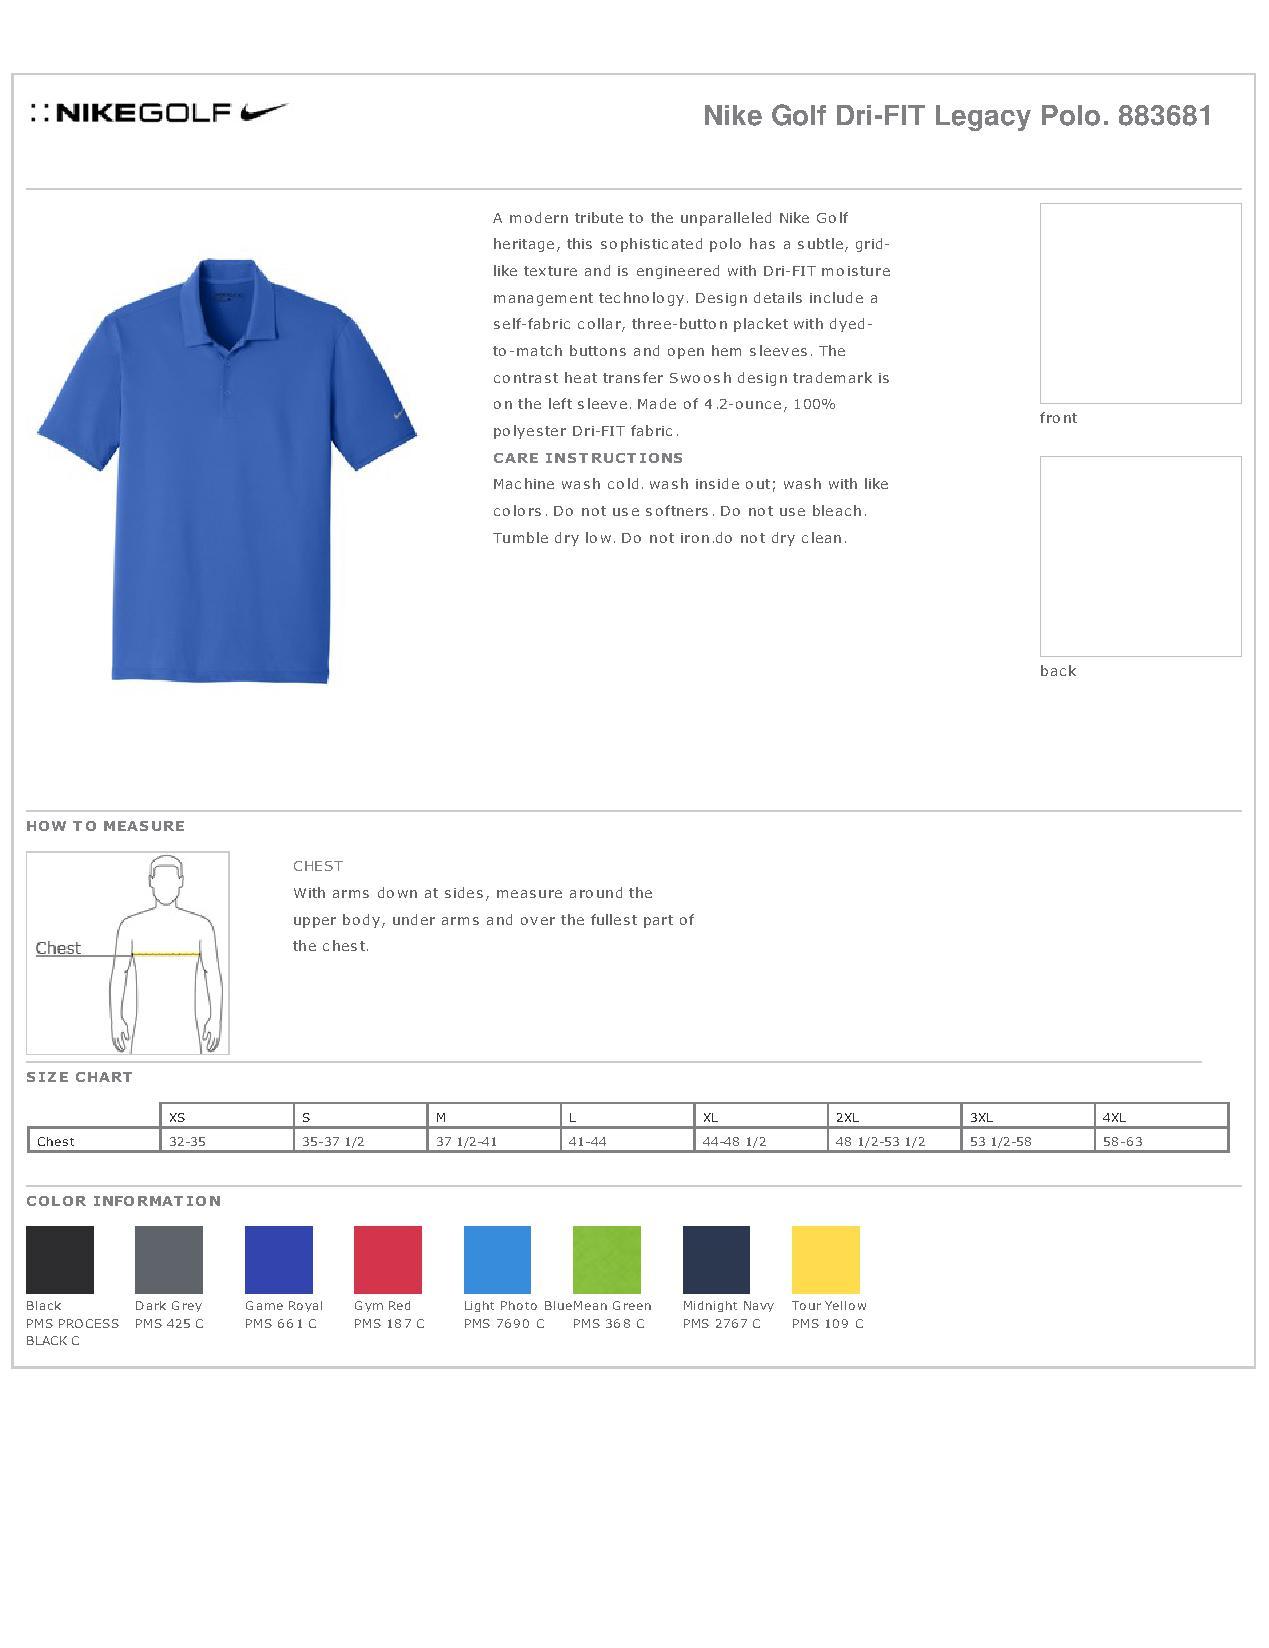 d533d4575 Nike Golf 883681 - Men's Dri-FIT Legacy Polo - Men's Sport Shirts